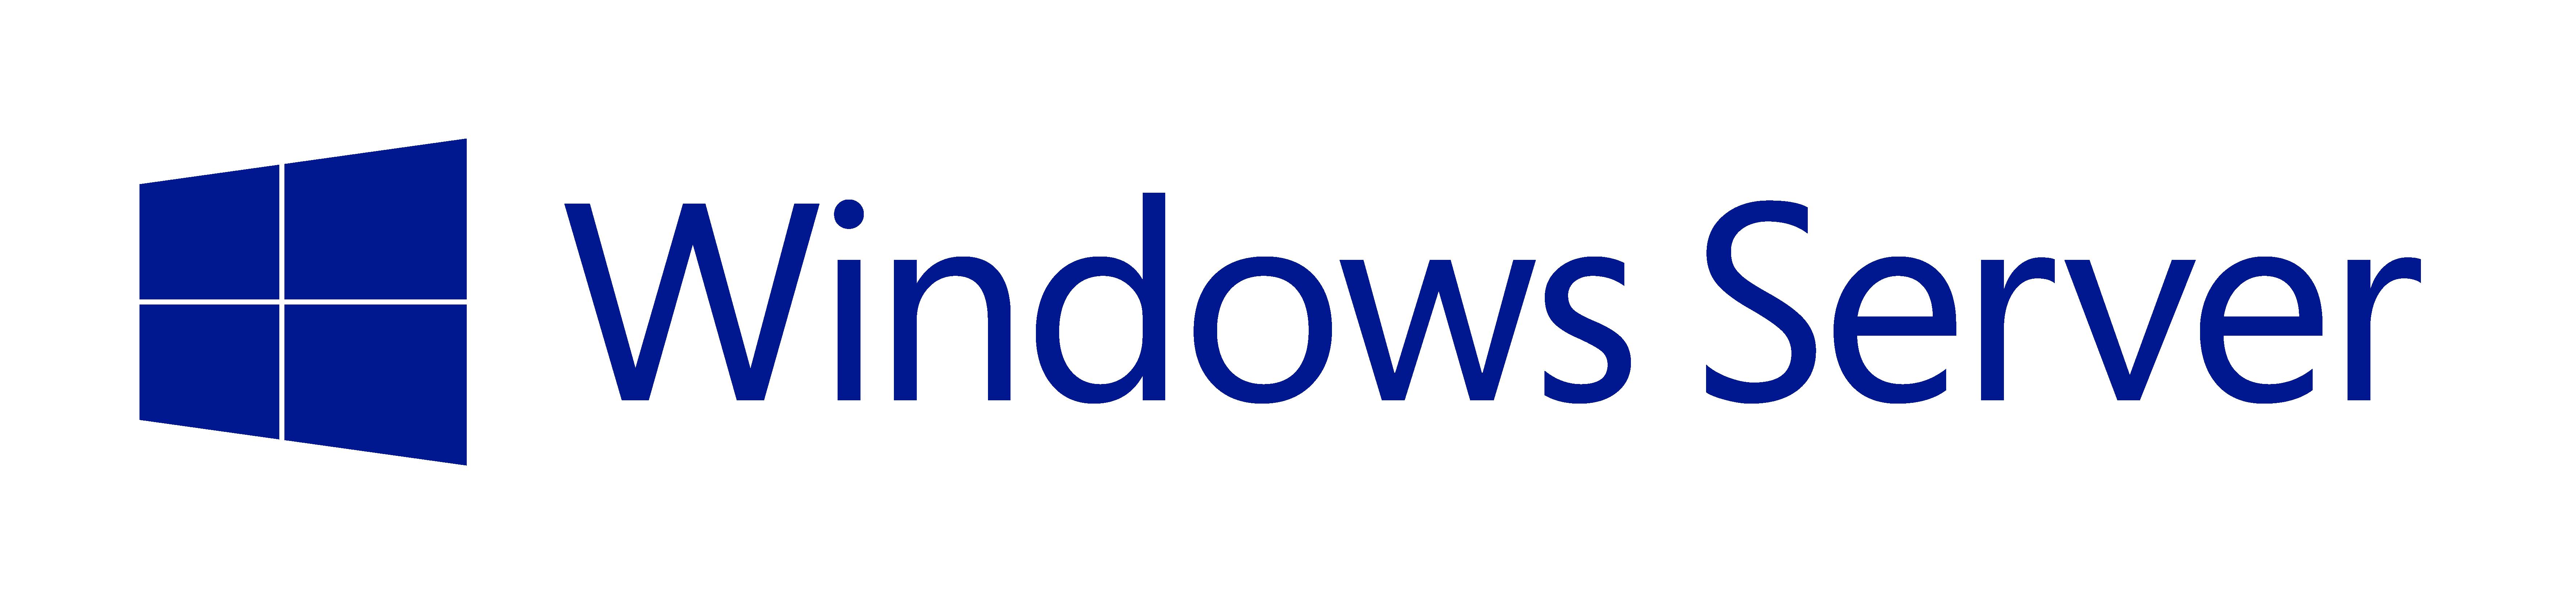 Pin by Neeraj Dewangan on Courses Windows server